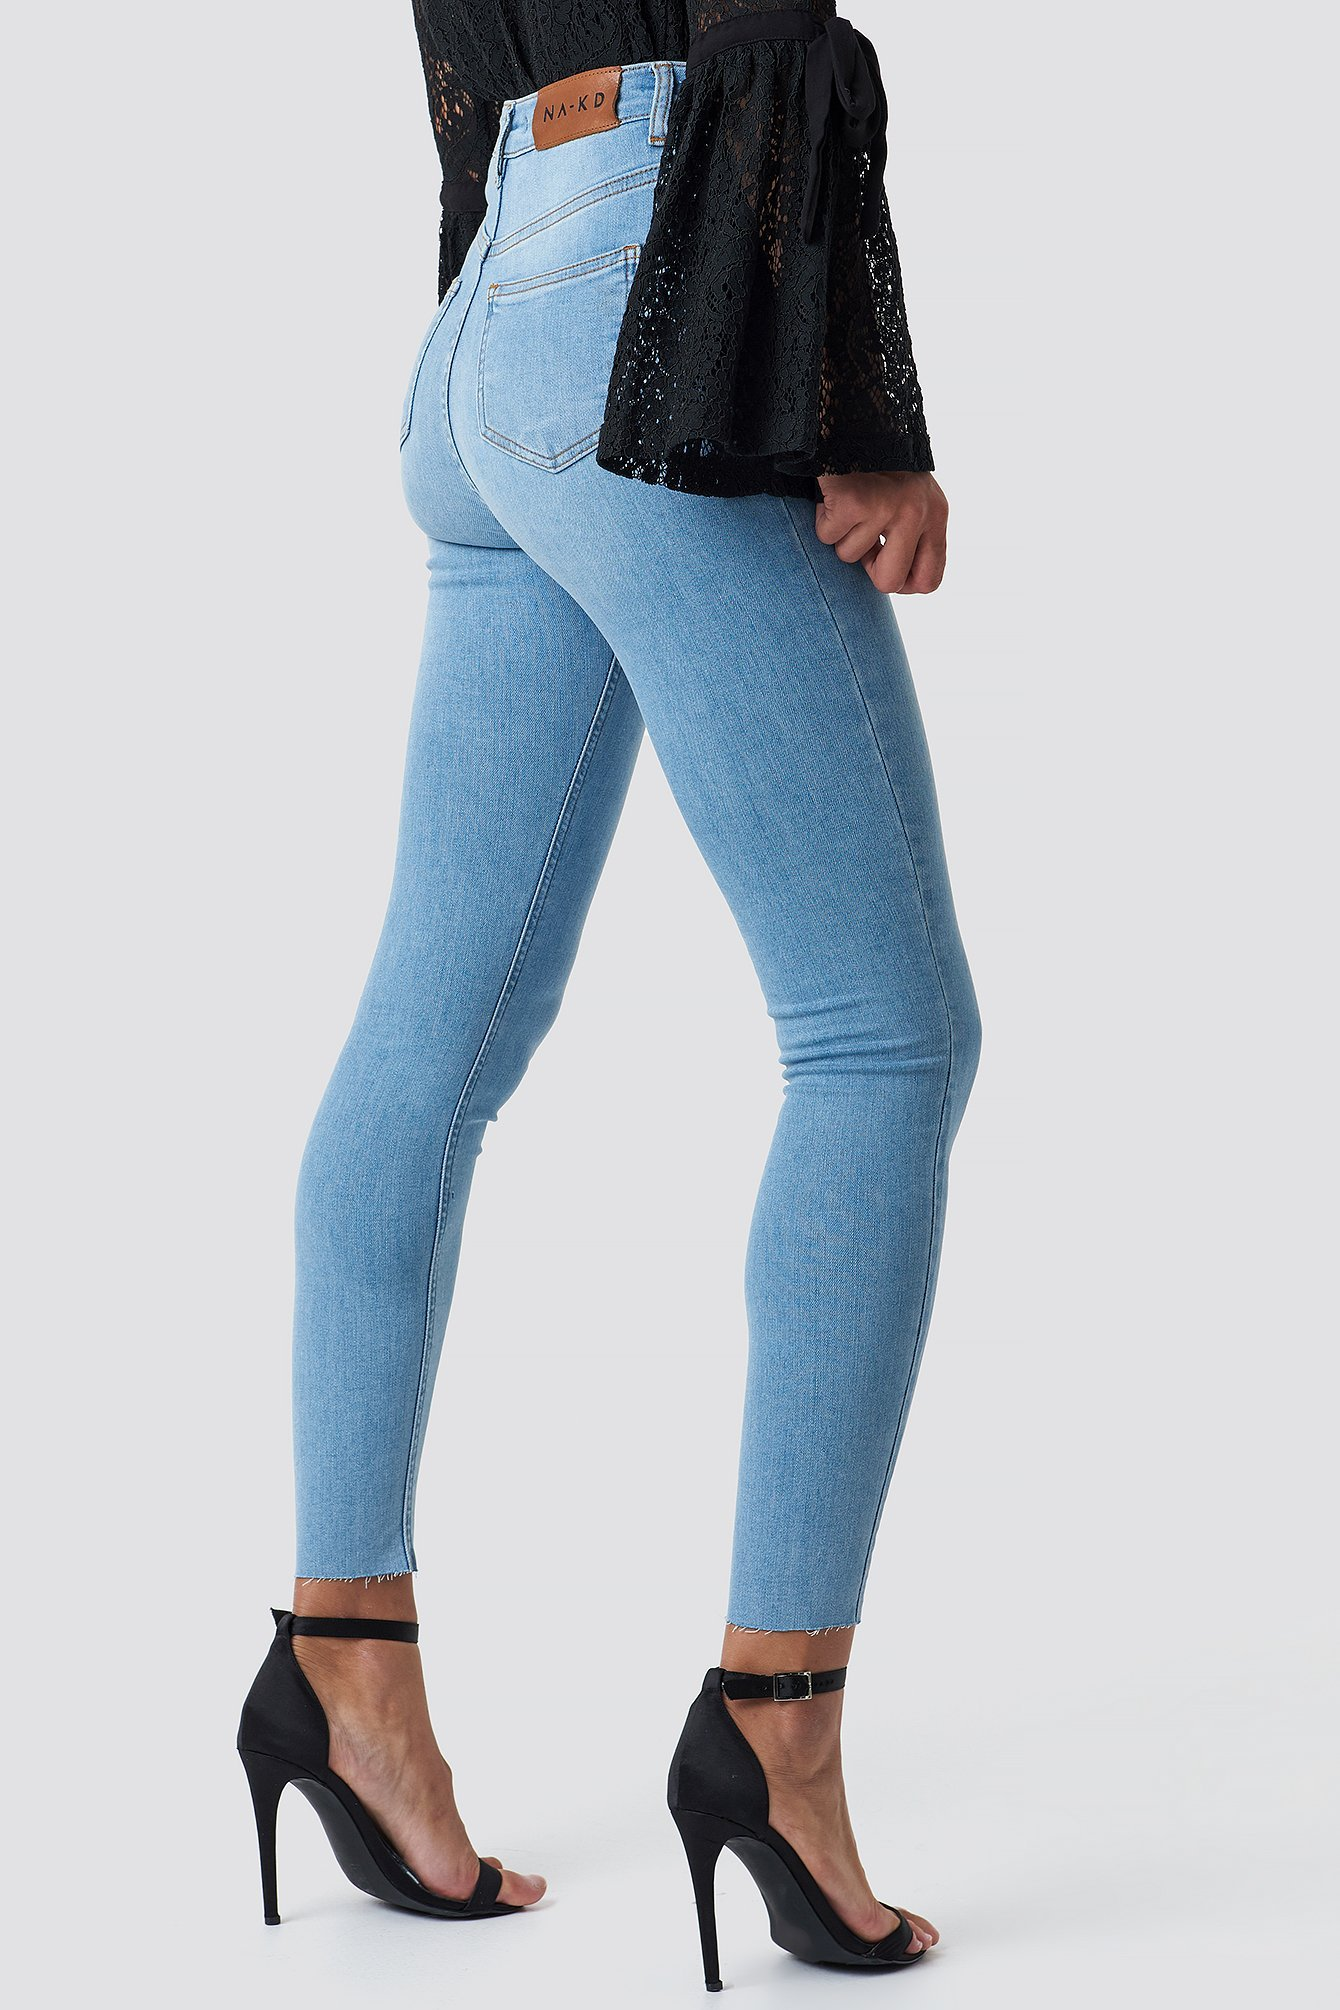 nakd_skinny_high_waist_raw_hem_jeans_1100-000796-0047_03i